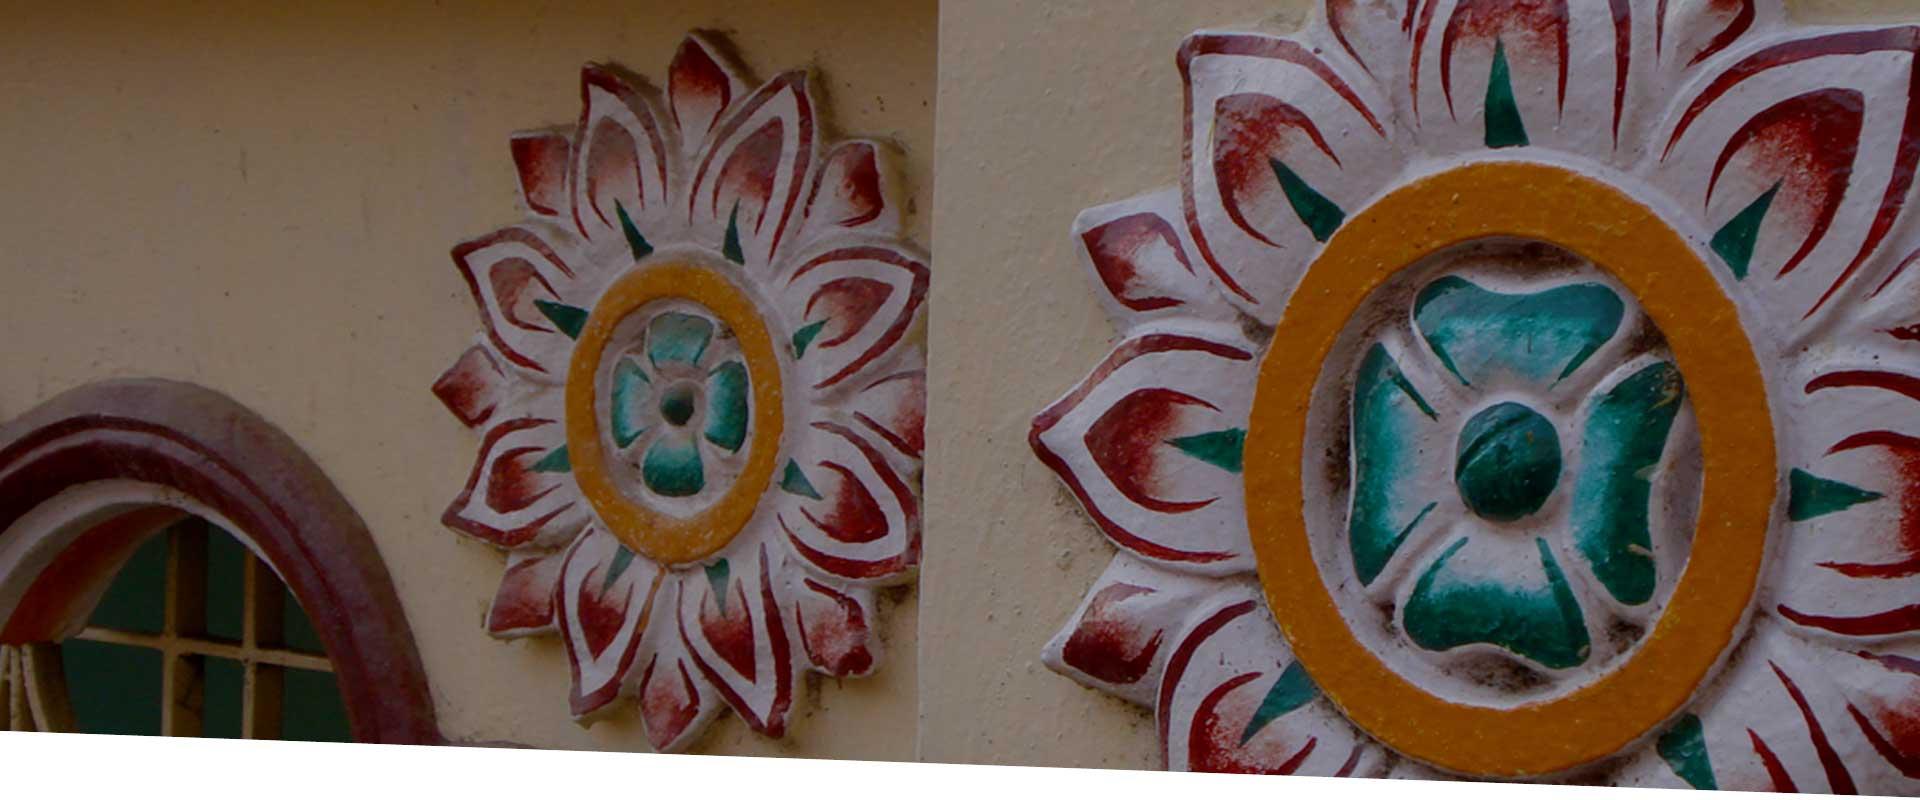 Jhadol And Udaipur Carpe Diem Education International